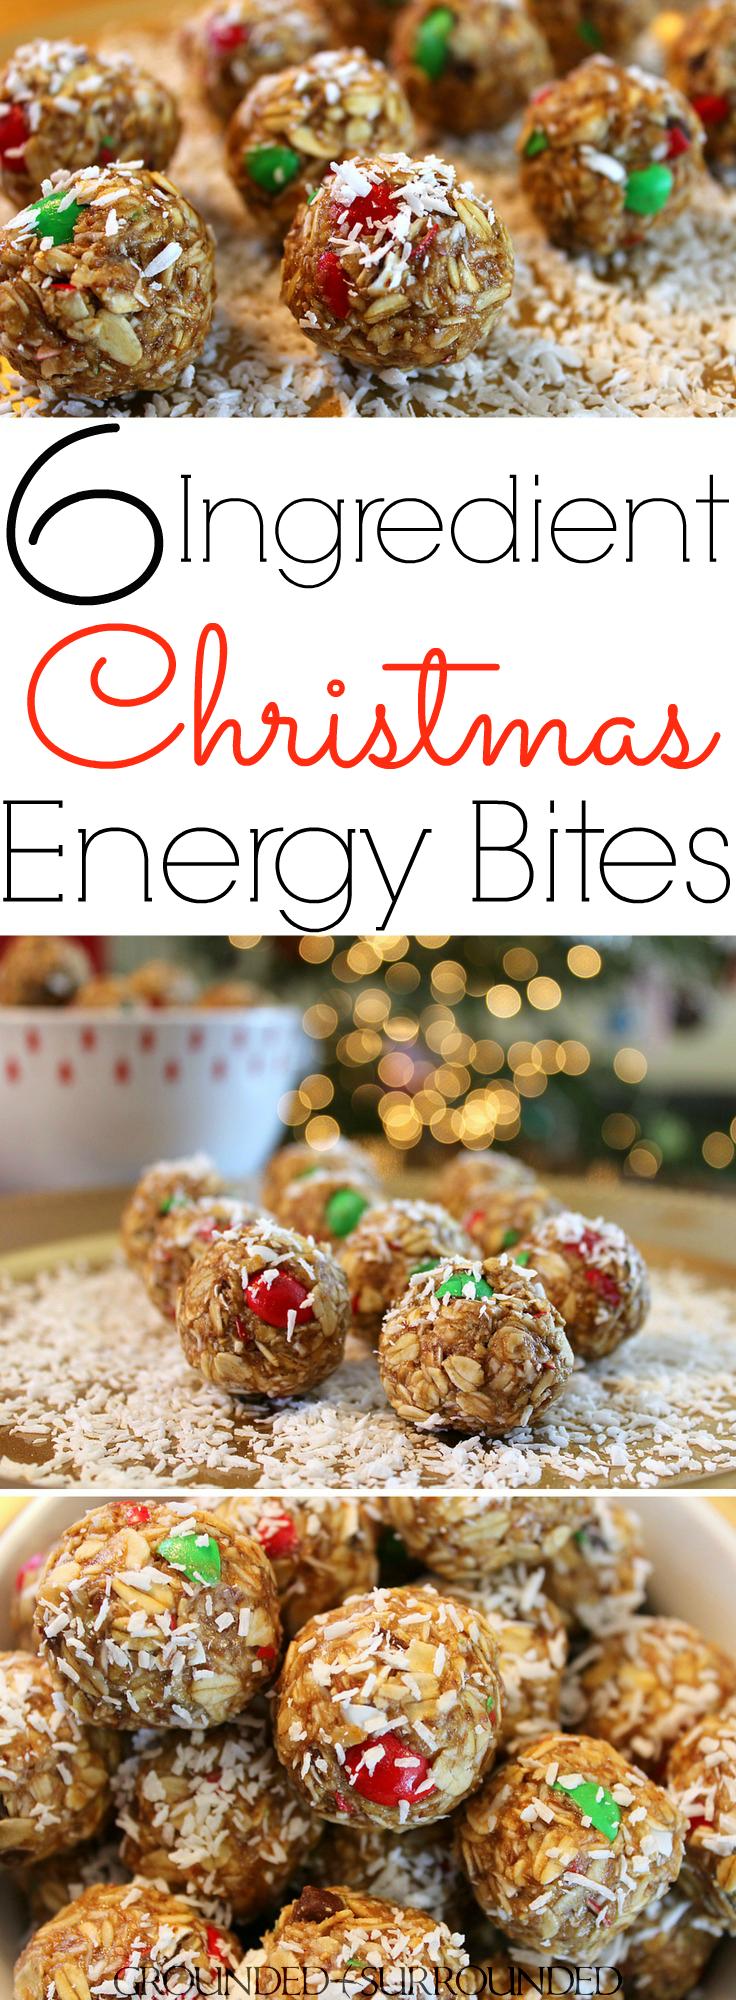 6 Ingredient Christmas Energy Bites Recipe Healthy